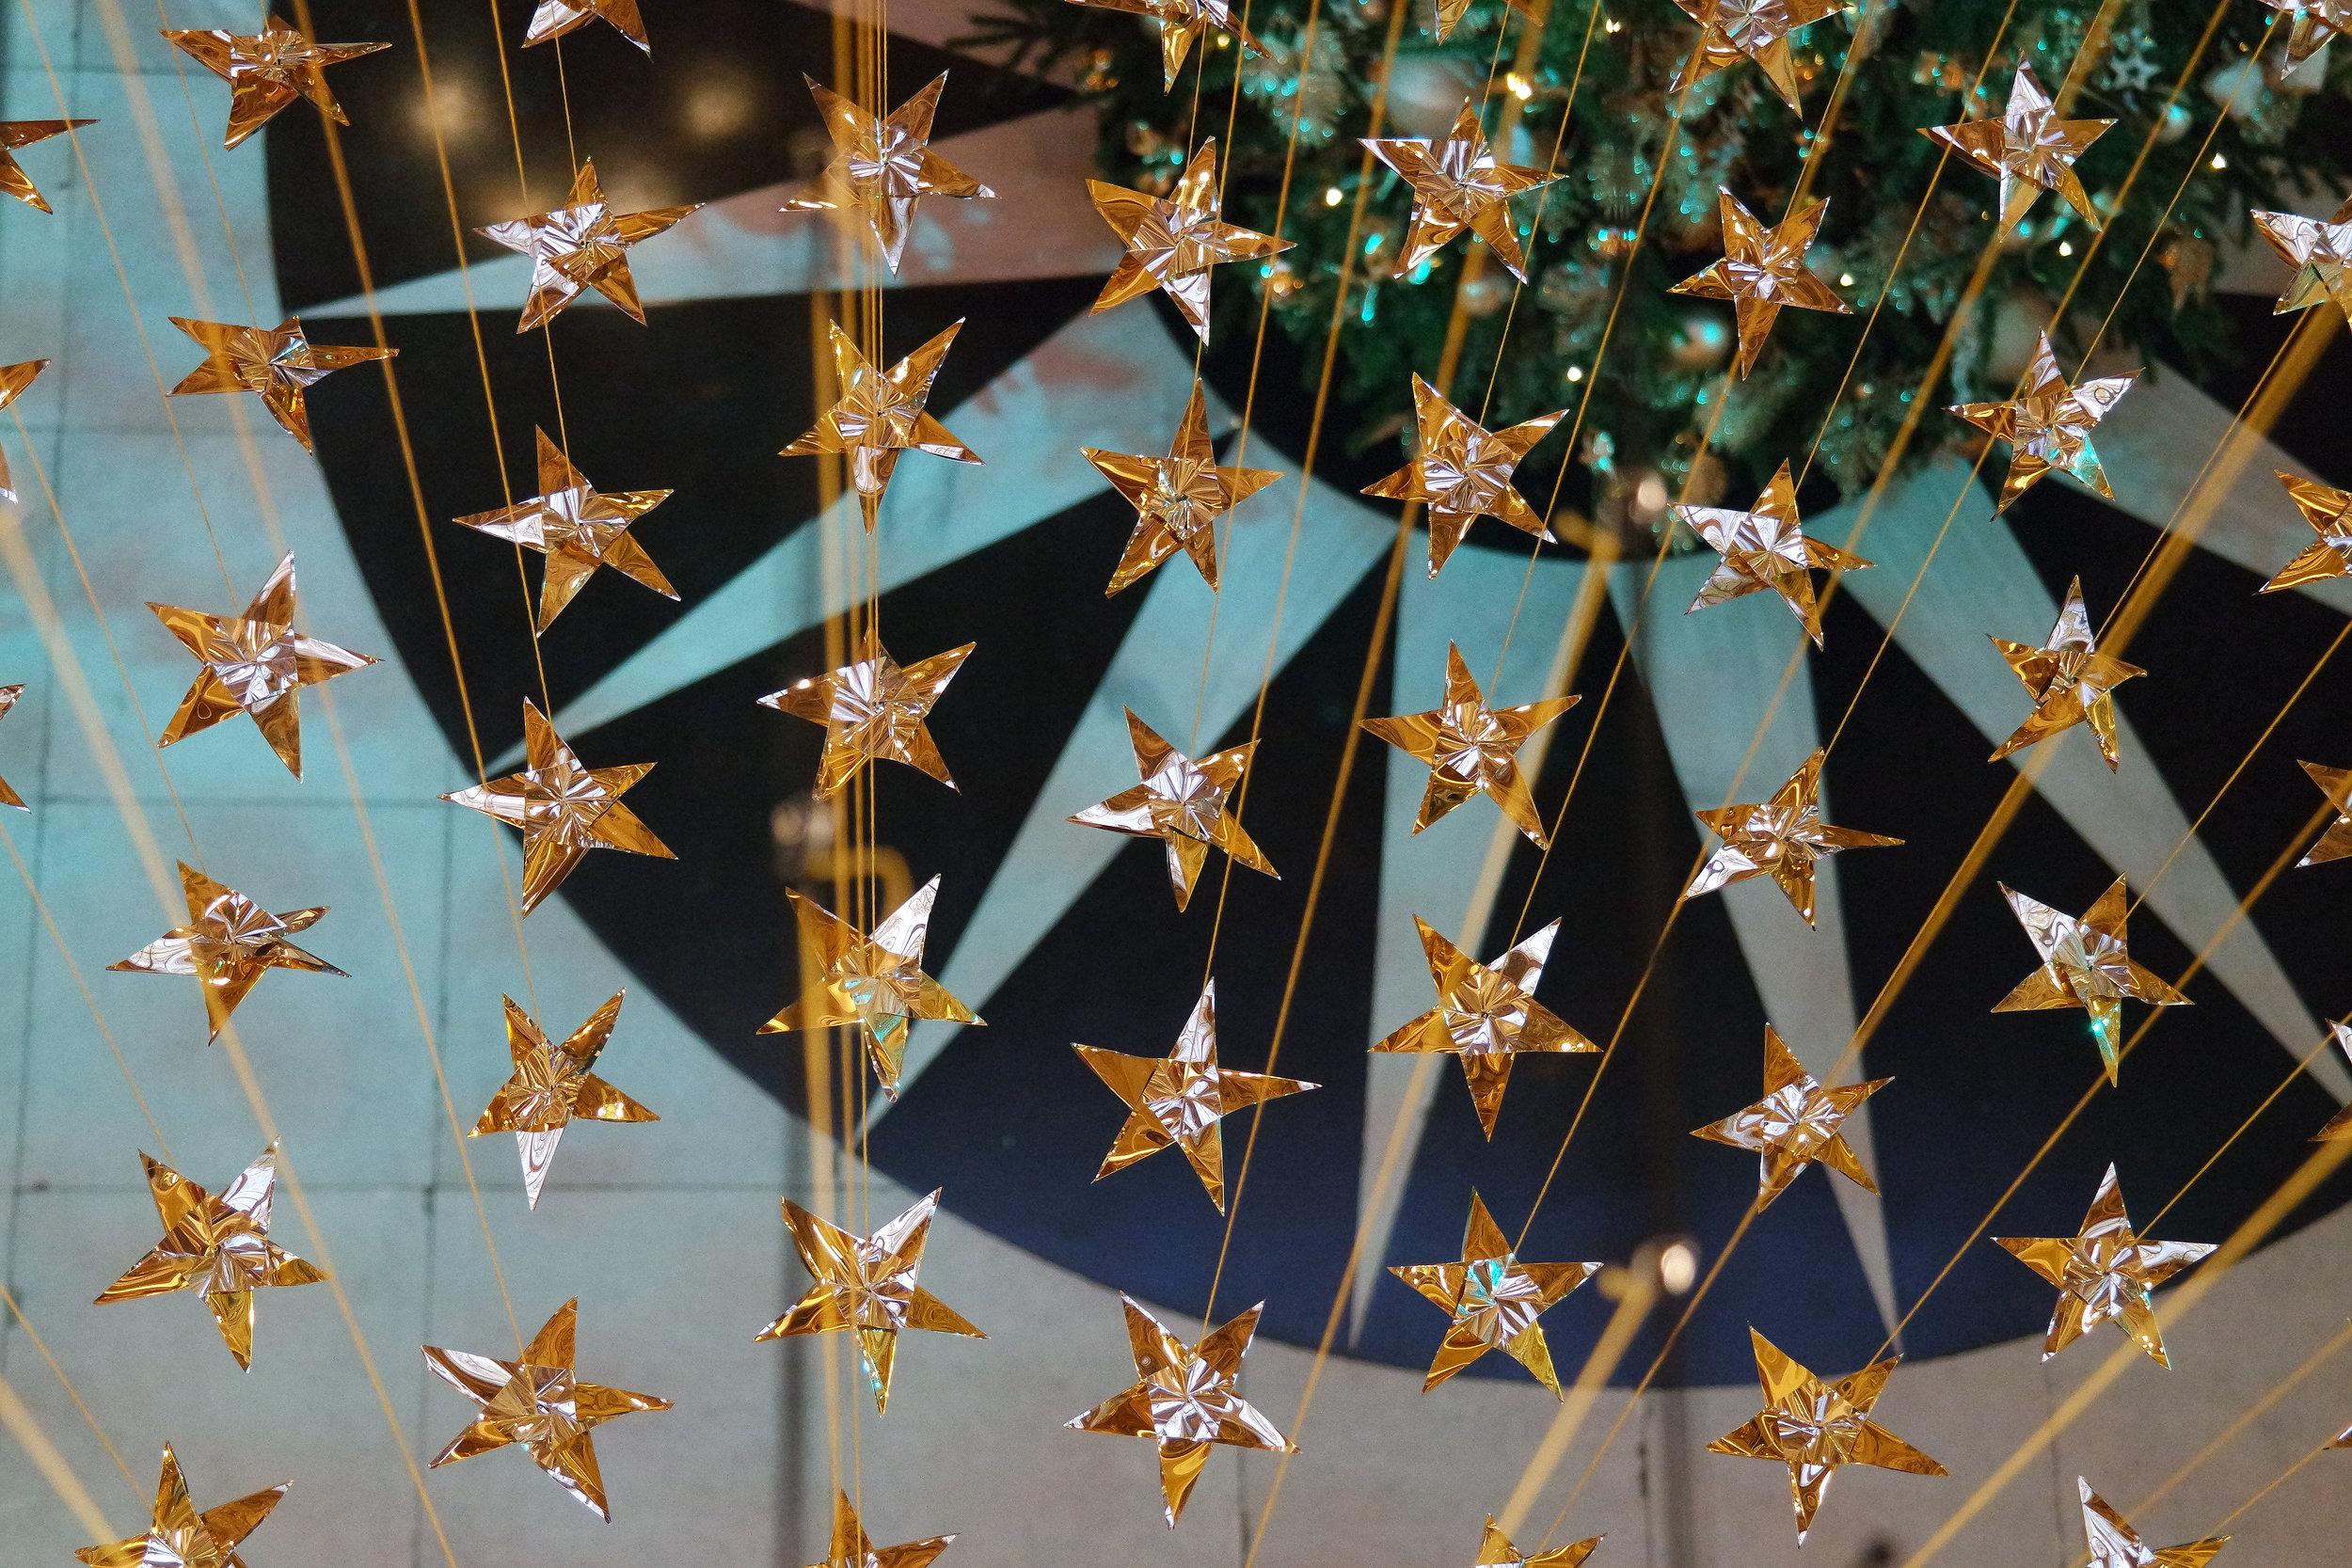 SBM_CA-Atrium-Christmas-Decoration-2018-0005.jpg